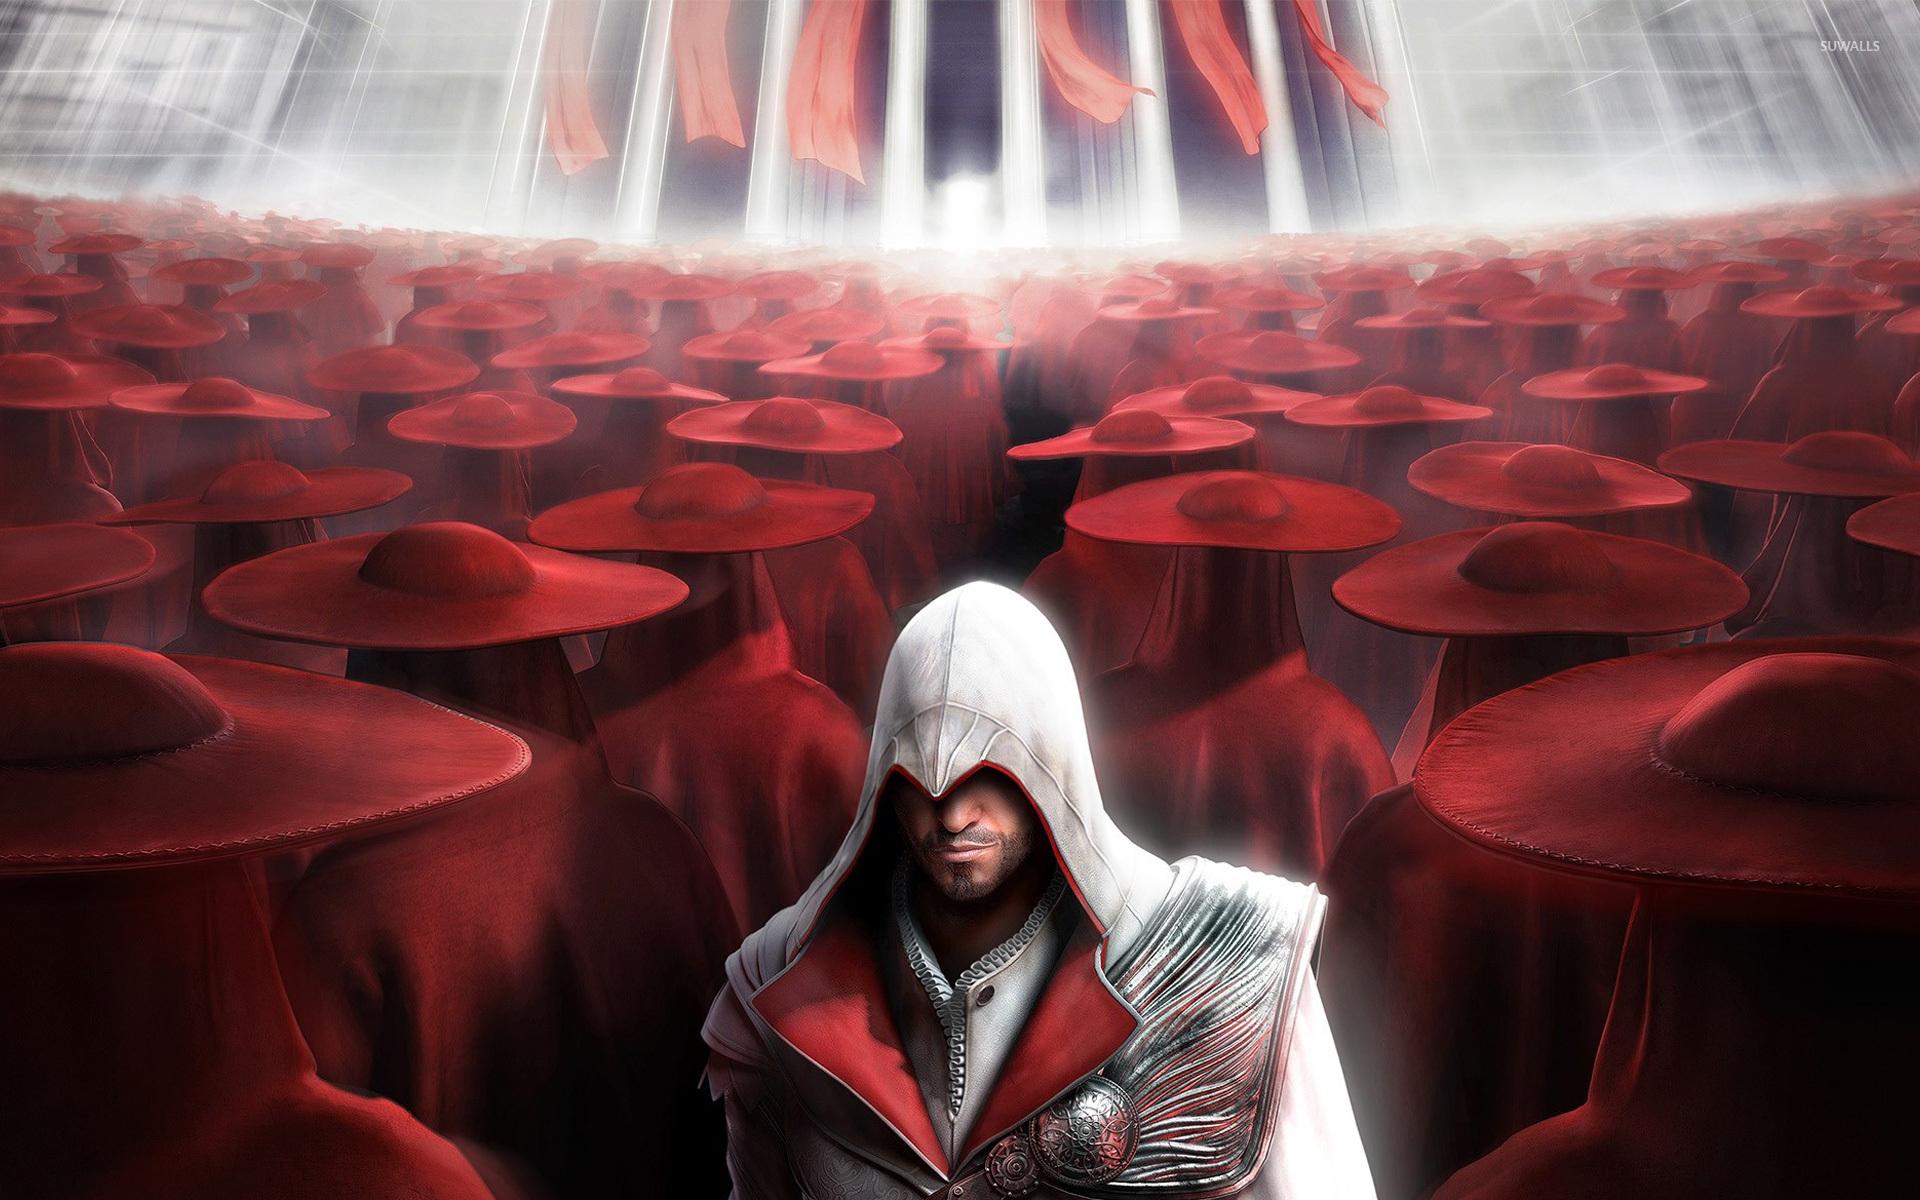 Assassins Creed Brotherhood 2 Wallpaper Game